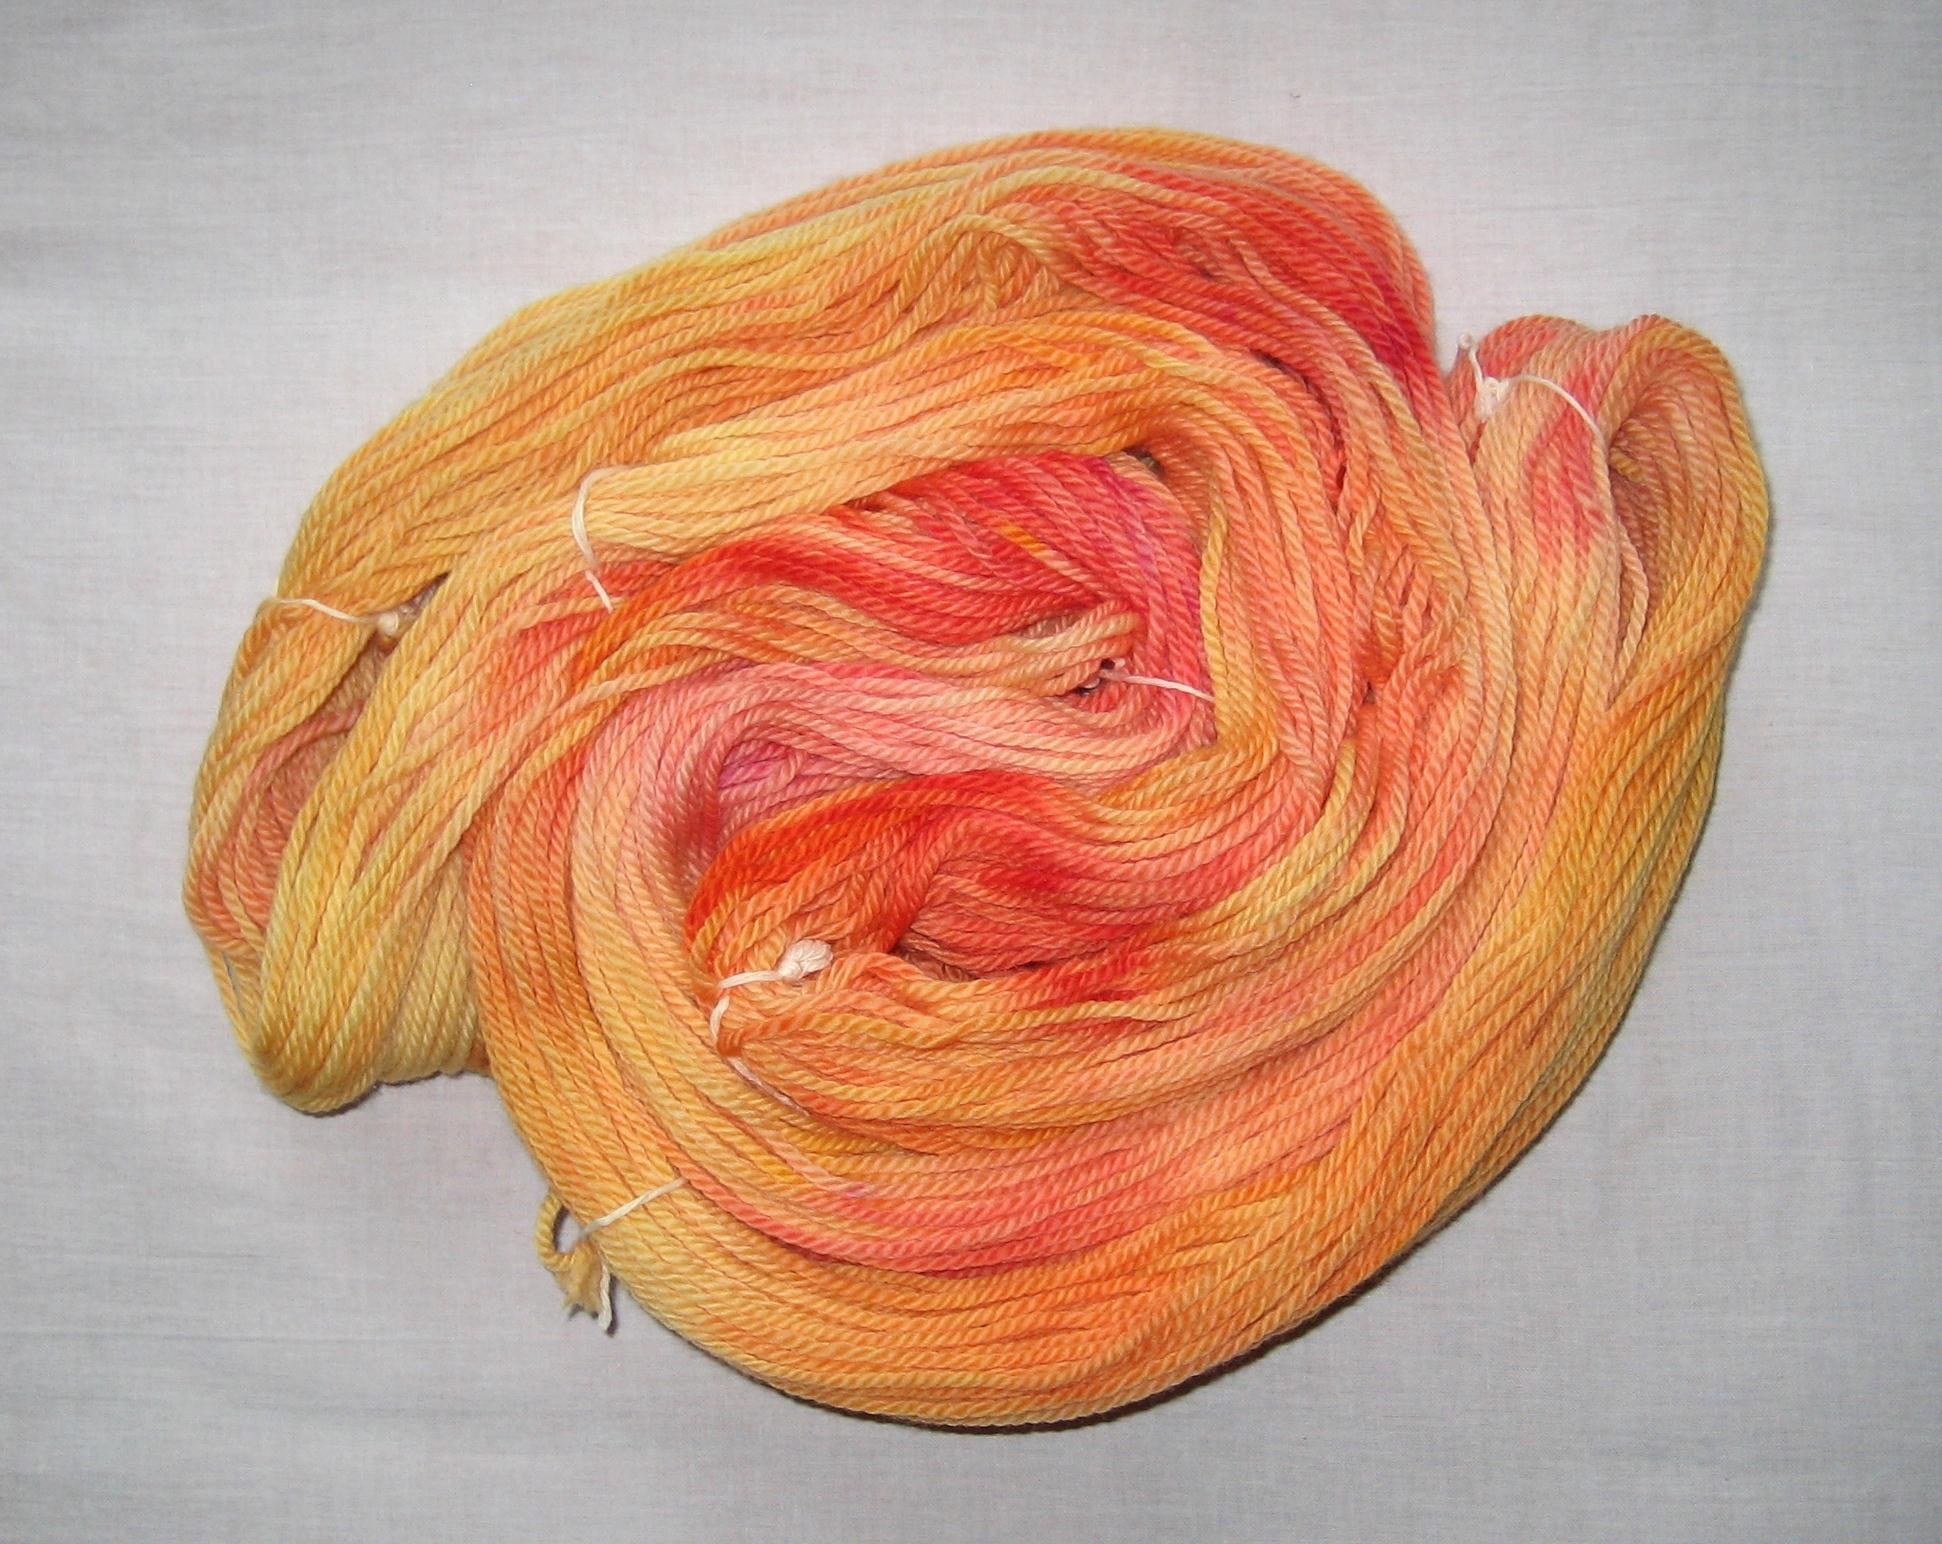 garnyarn-håndfarvet-garn-tyk-merinould-superwash-gul-orangeroed